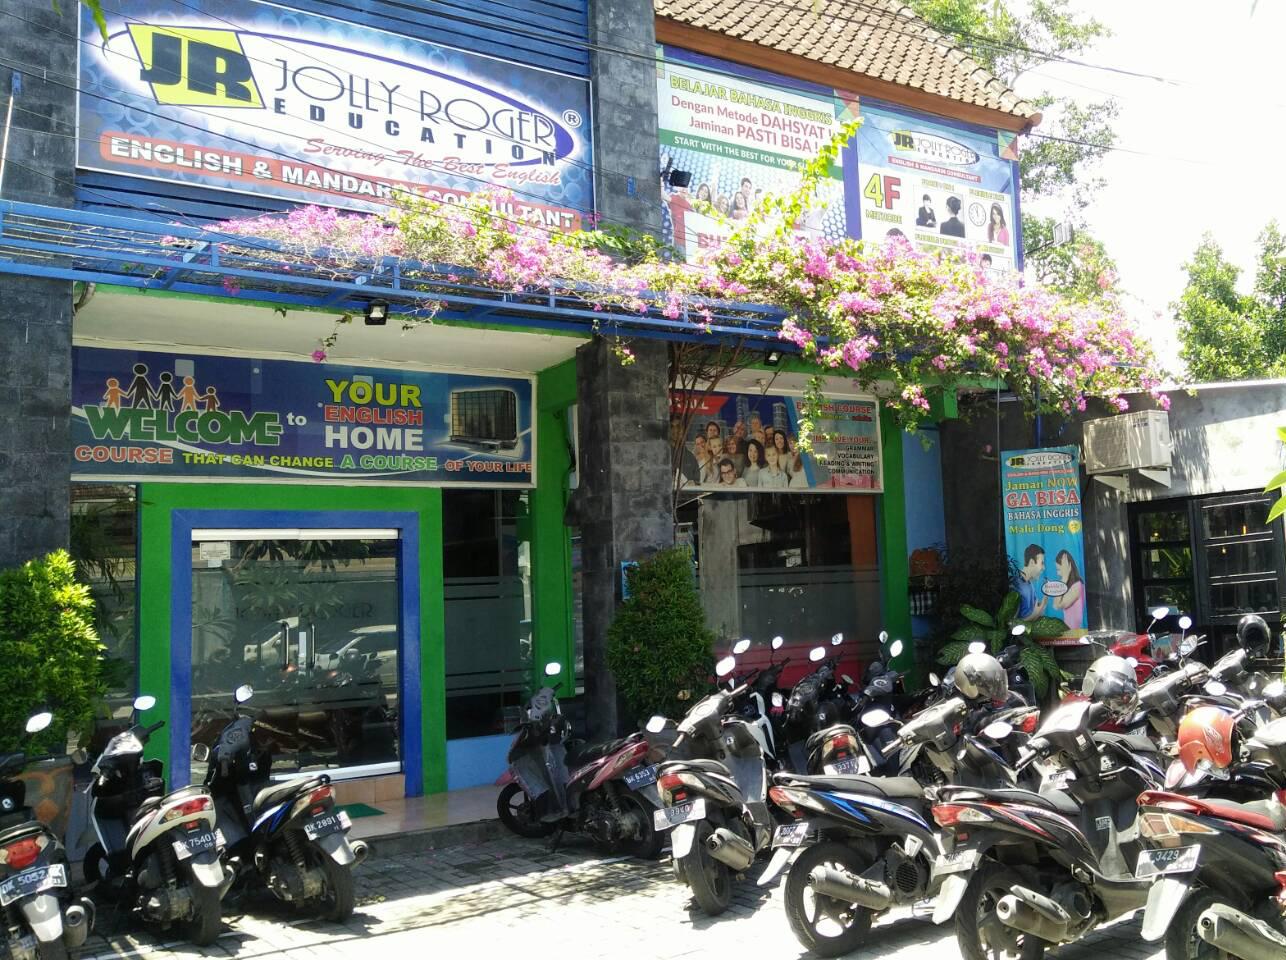 Graha Merdeka Unit 16-17Jl. Merdeka, Denpasar – Bali Telp. (0361) 248908 HP : 081 999 550 063 (XL) ; 081 239 777 737 (Telkomsel) ; 085 792 300 777 (Indosat)